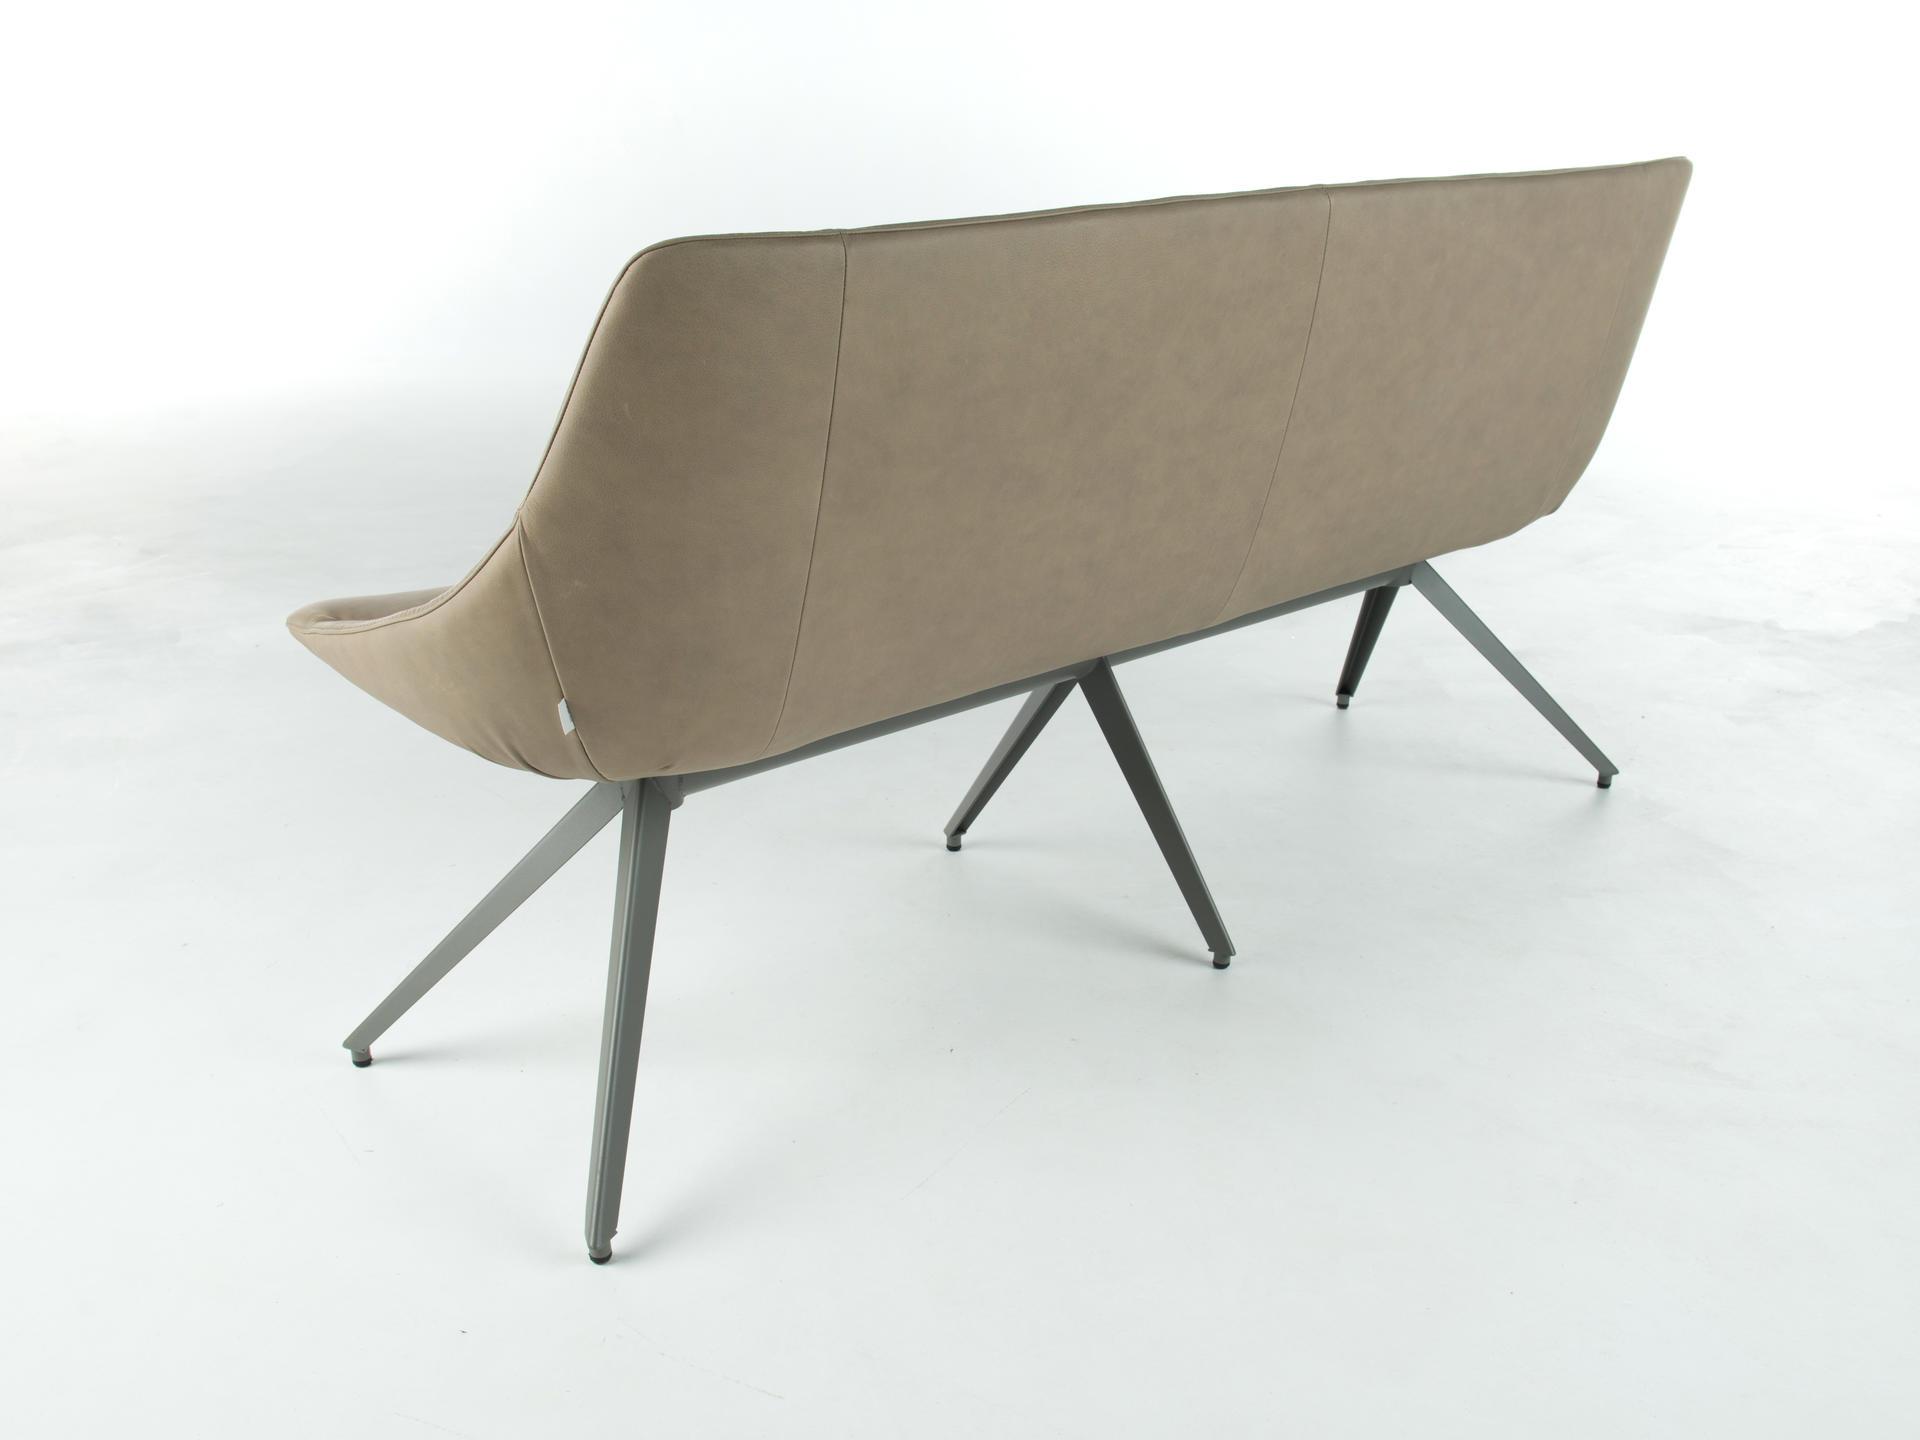 Скамья Maple bench, Bert Plantagie, фото 3